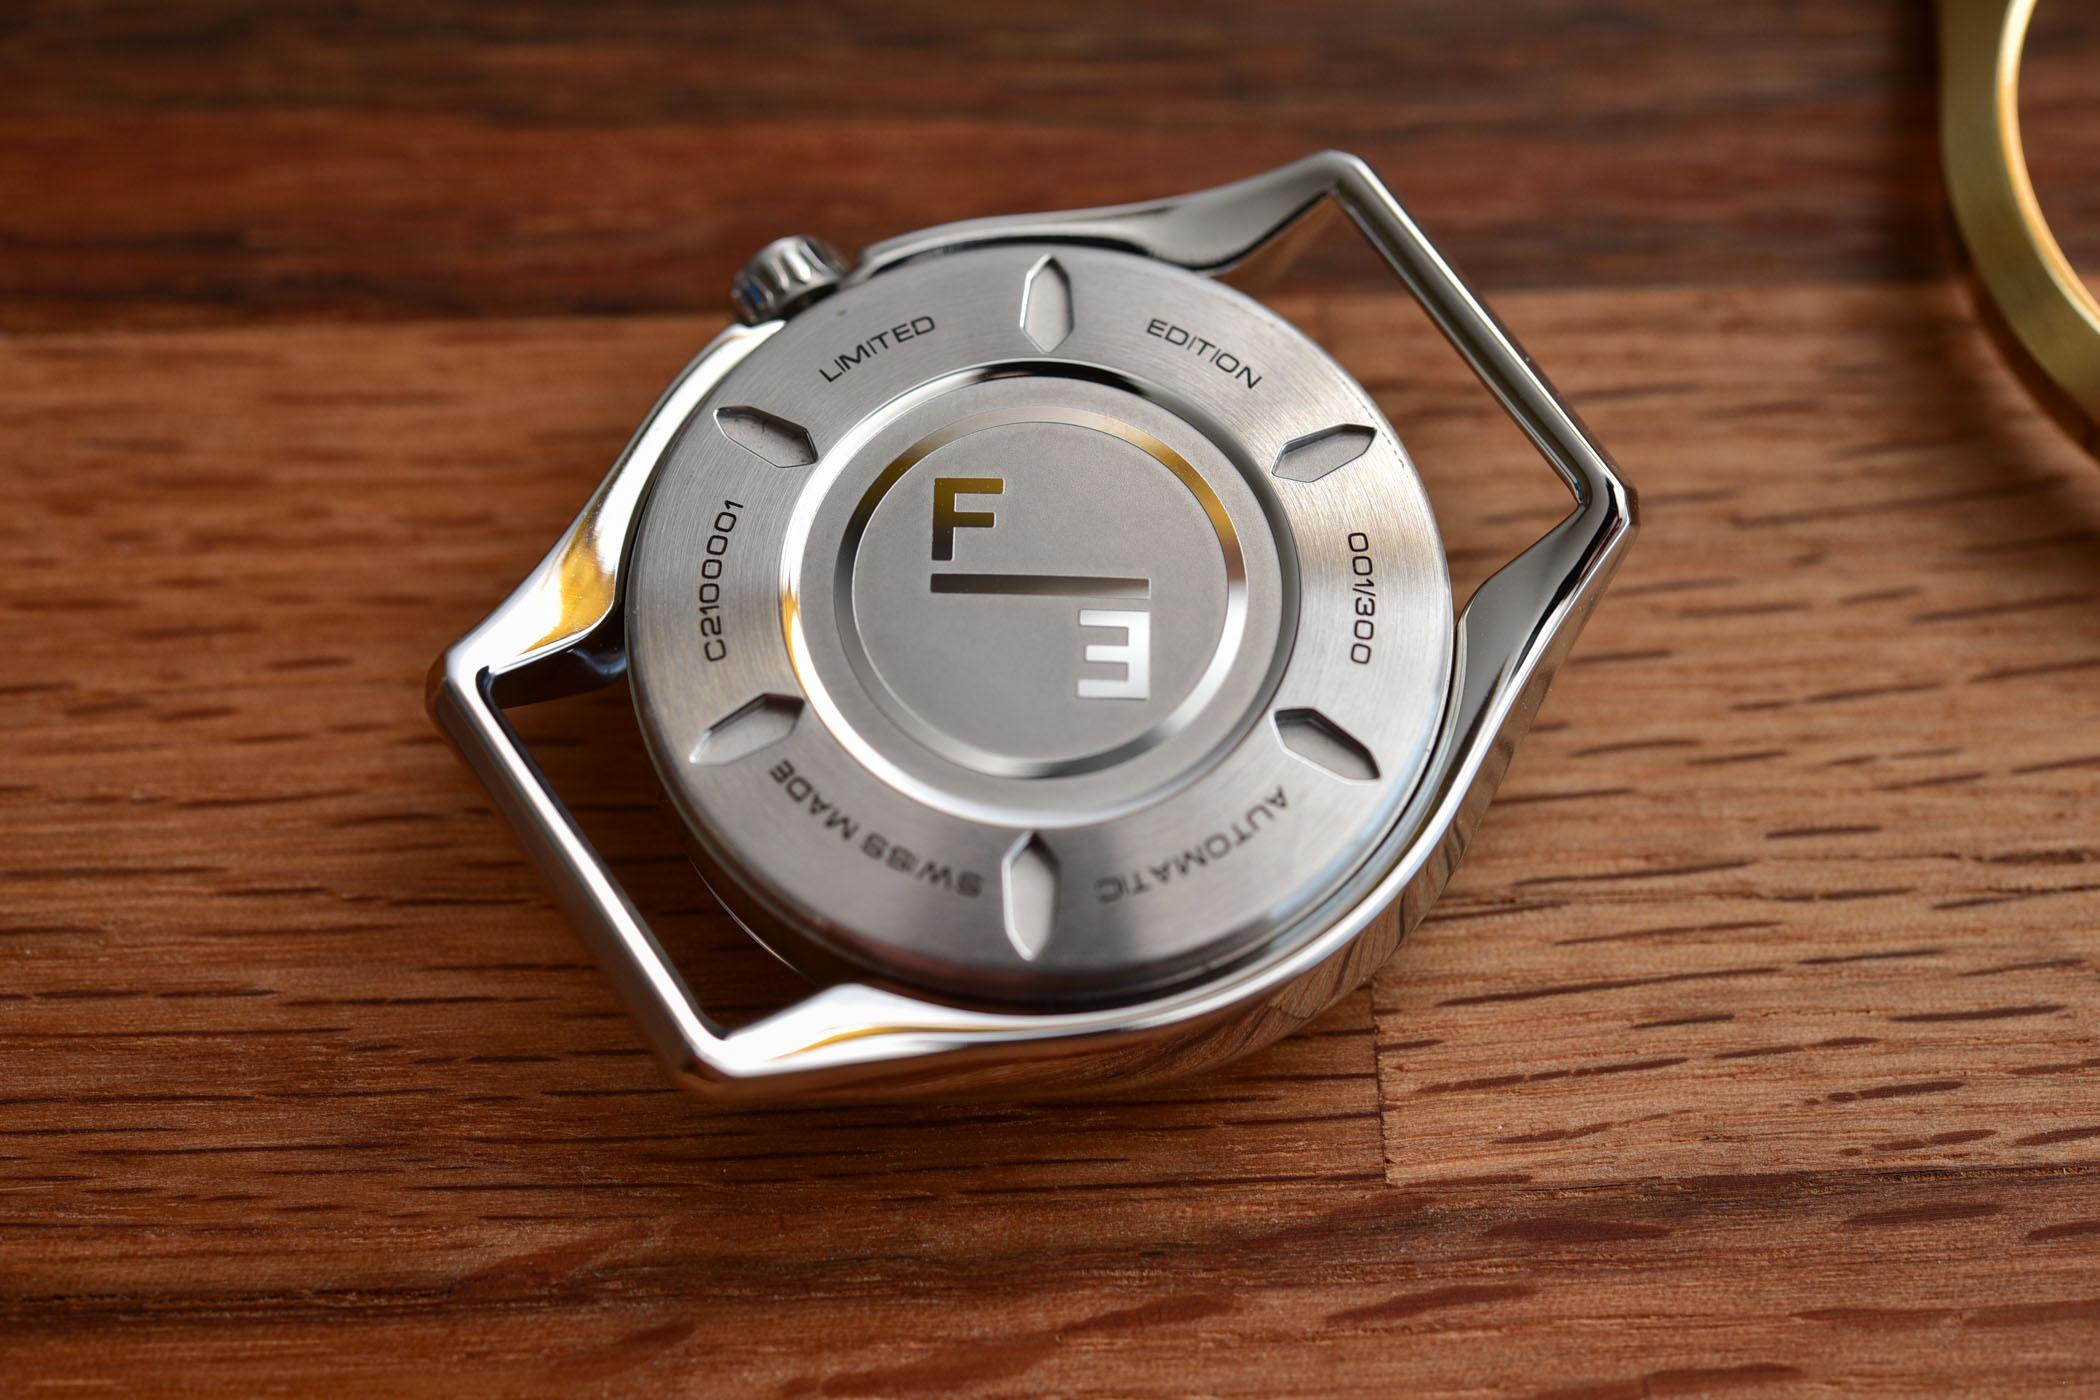 Fugue Watch Chronostase modular watch interchangeable case and strap - 8